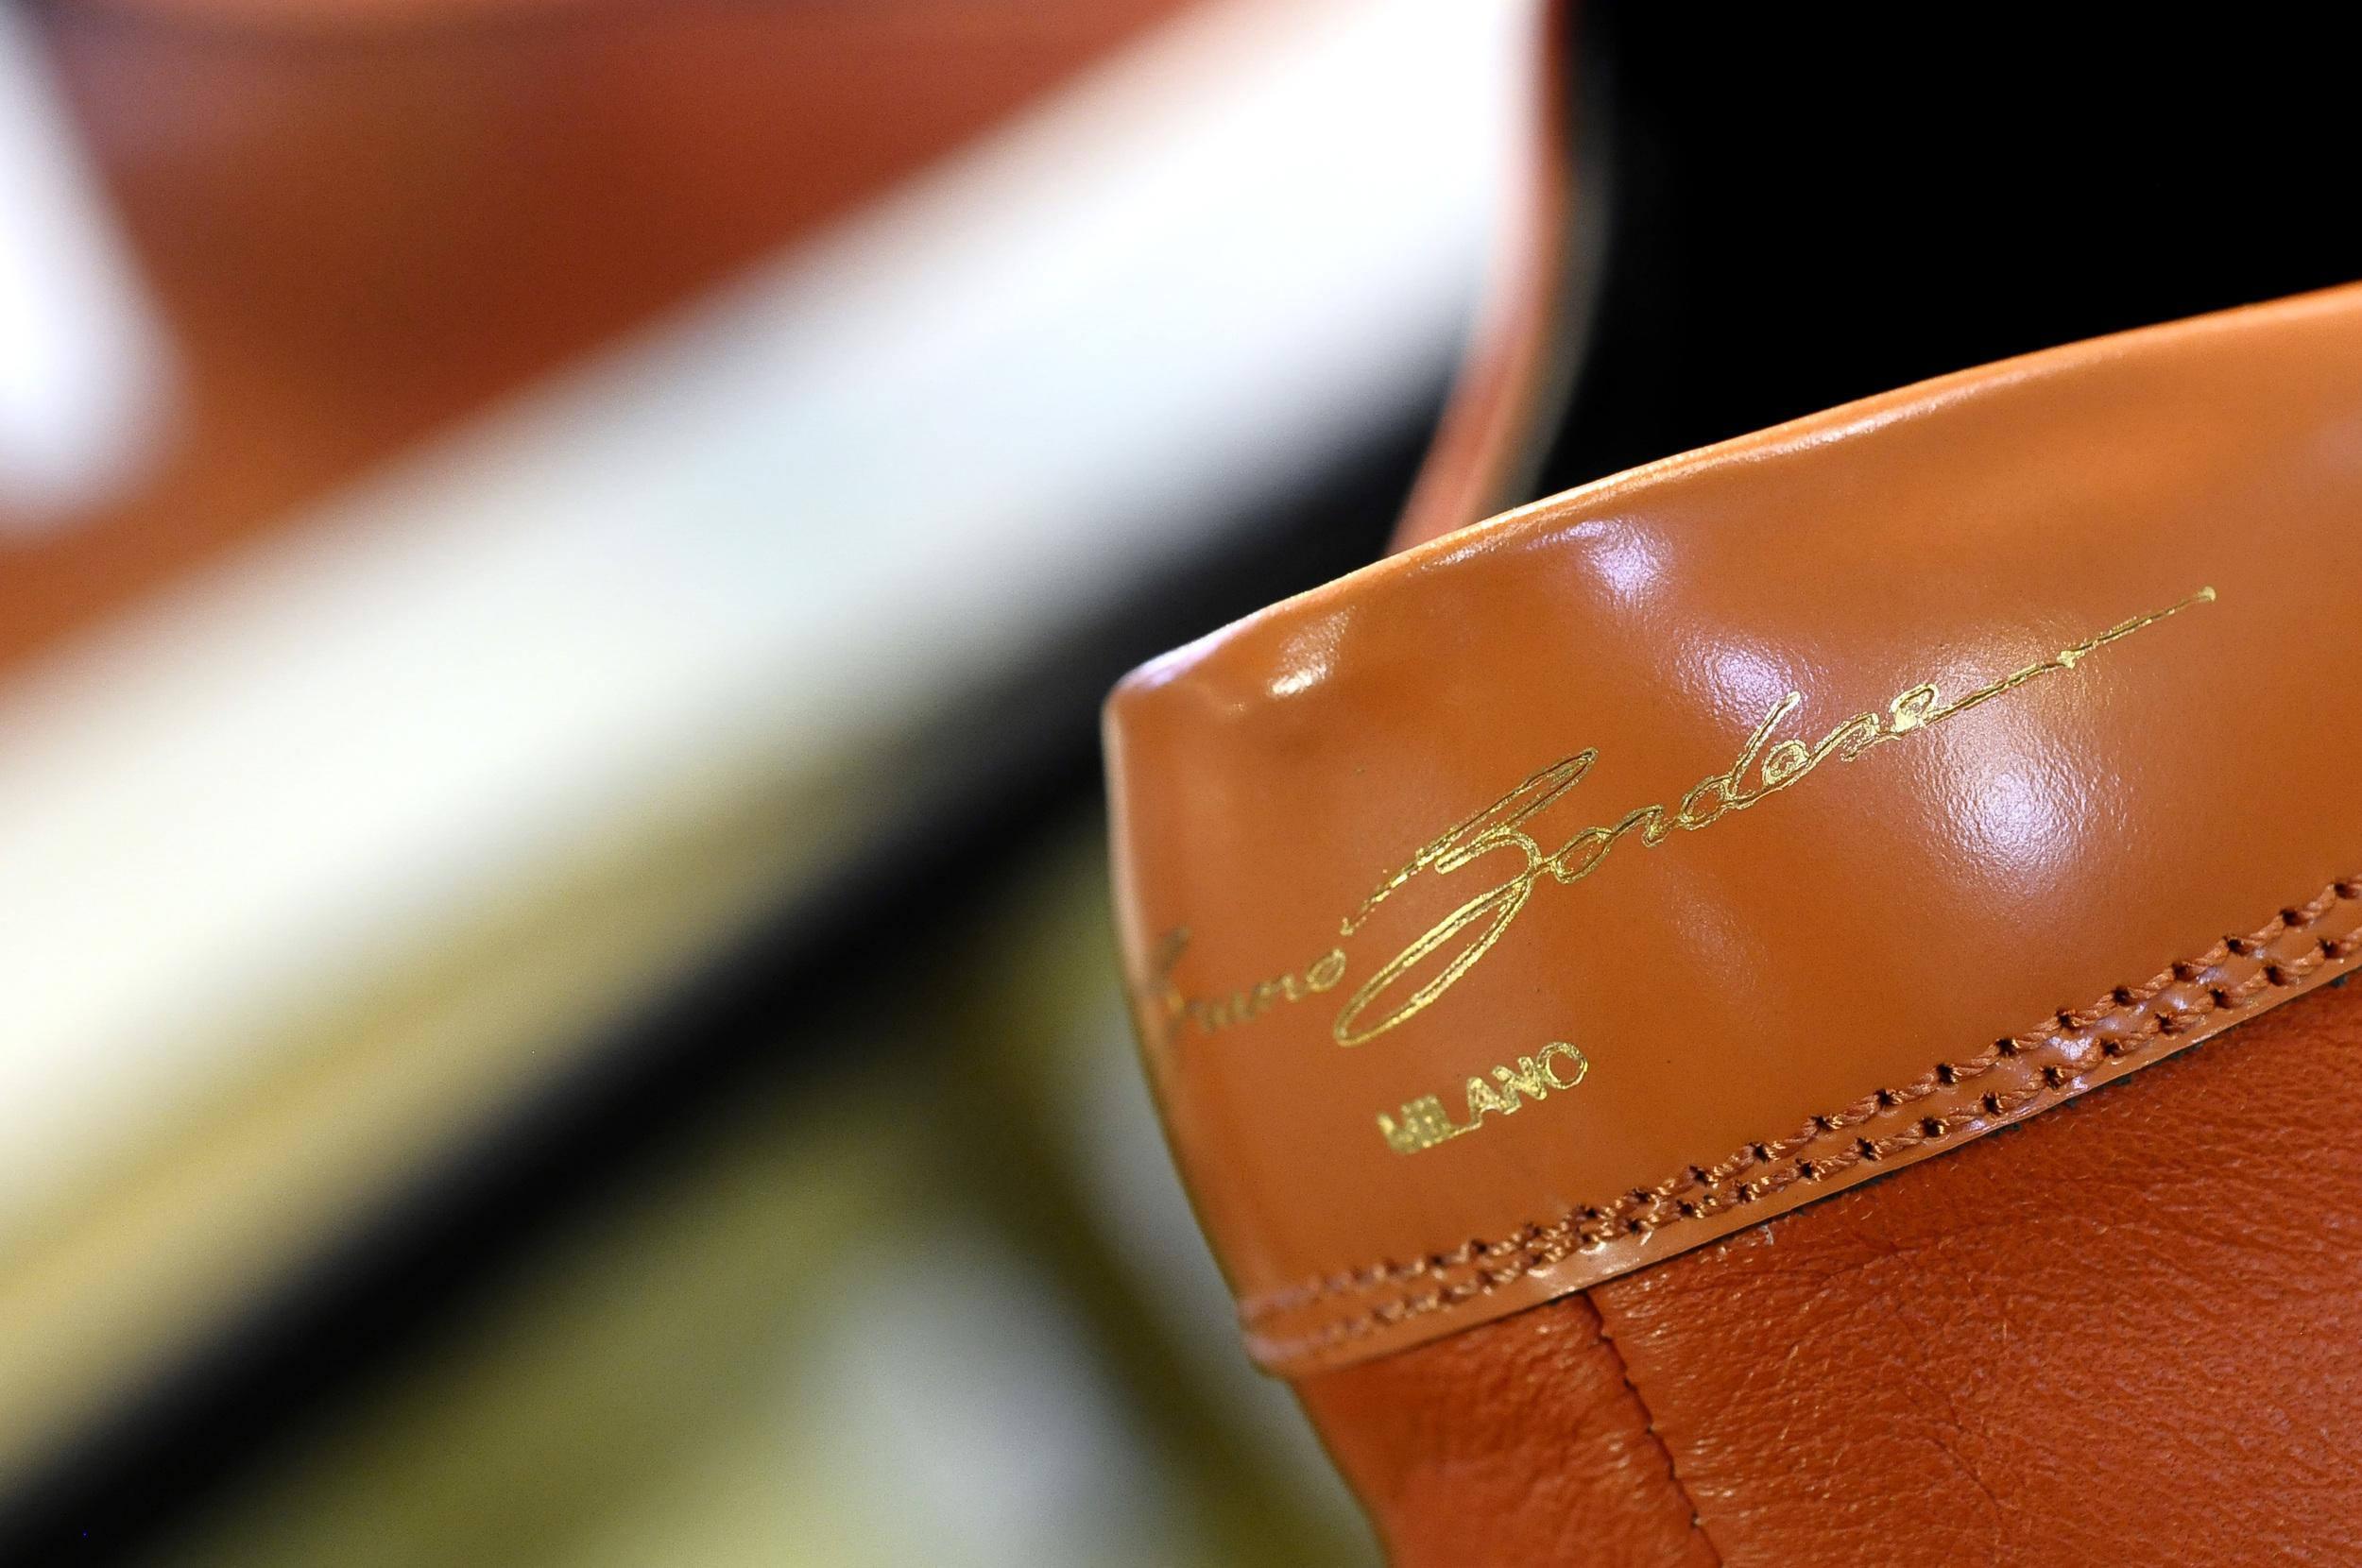 Luxury sneakers by BRUNO BORDESE